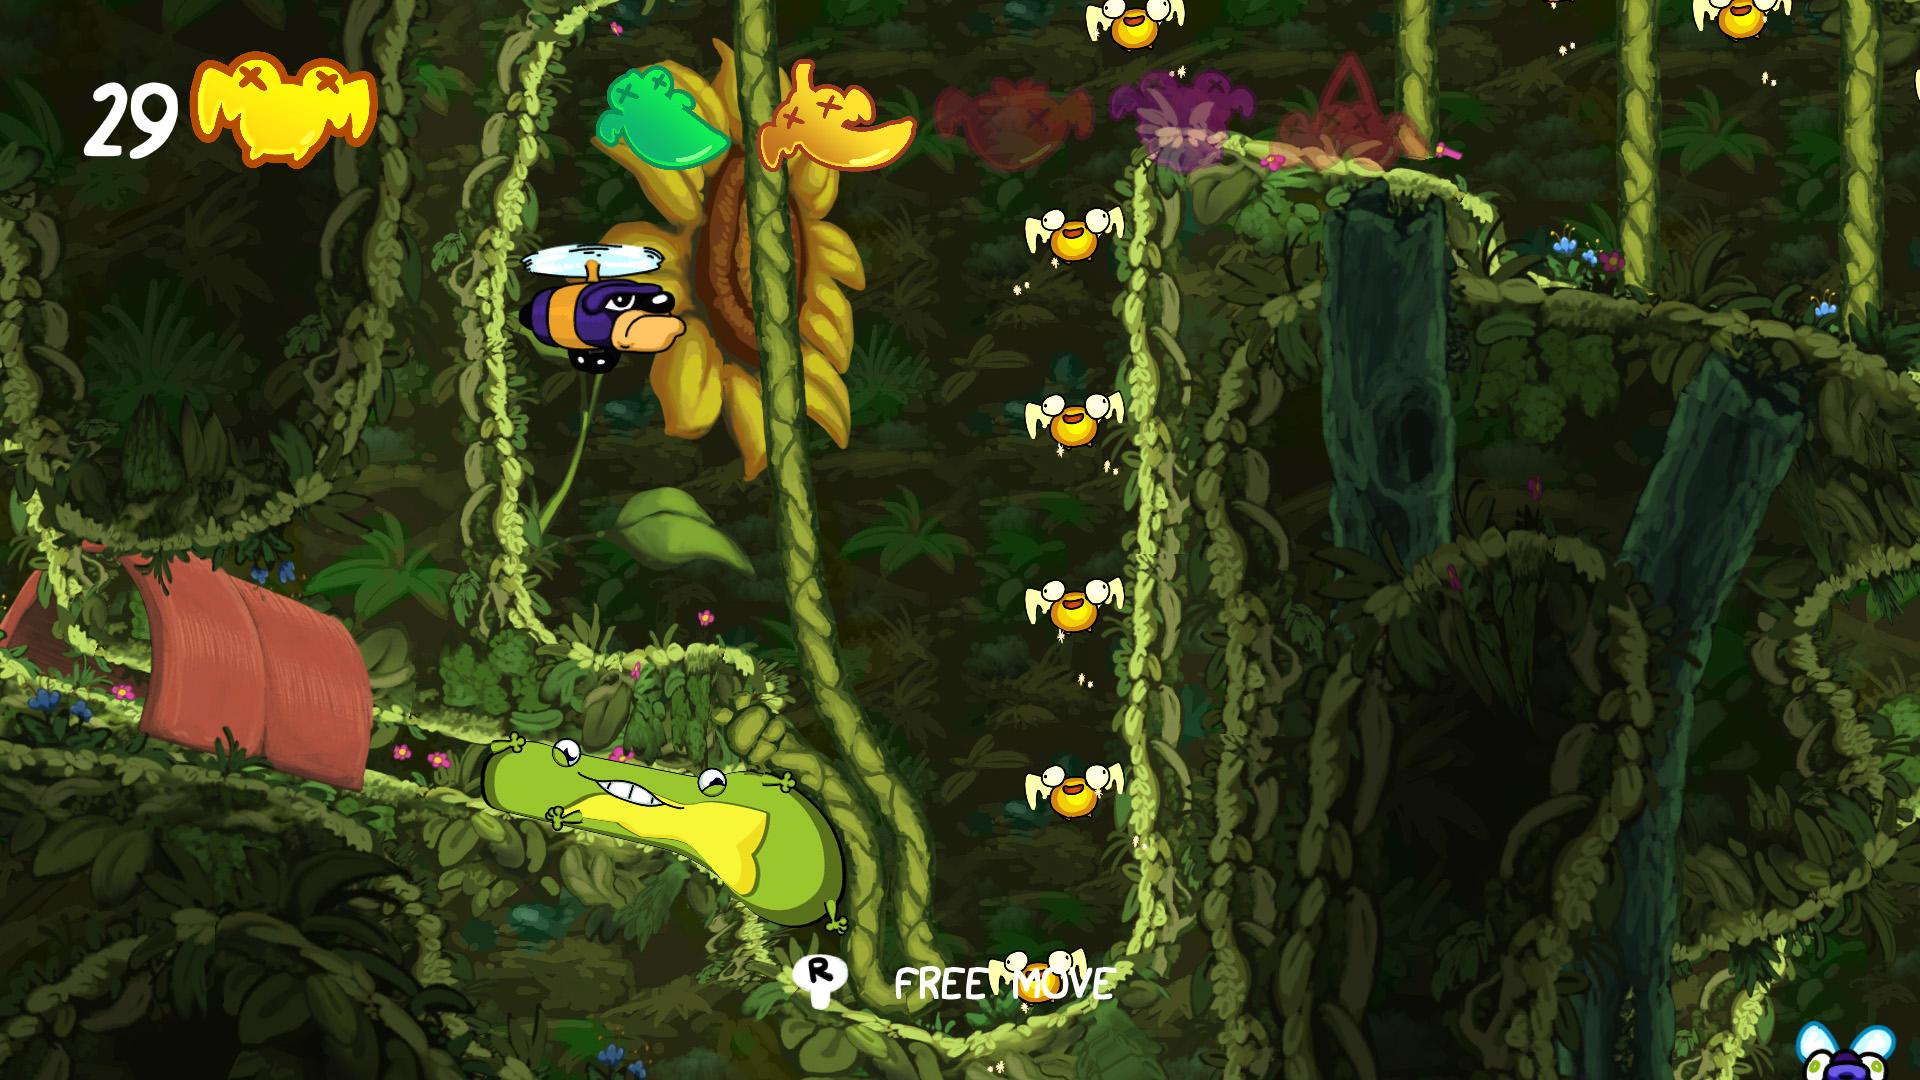 Pump the Frog screen_1920x1080_2018-11-22_11-16-10.jpg